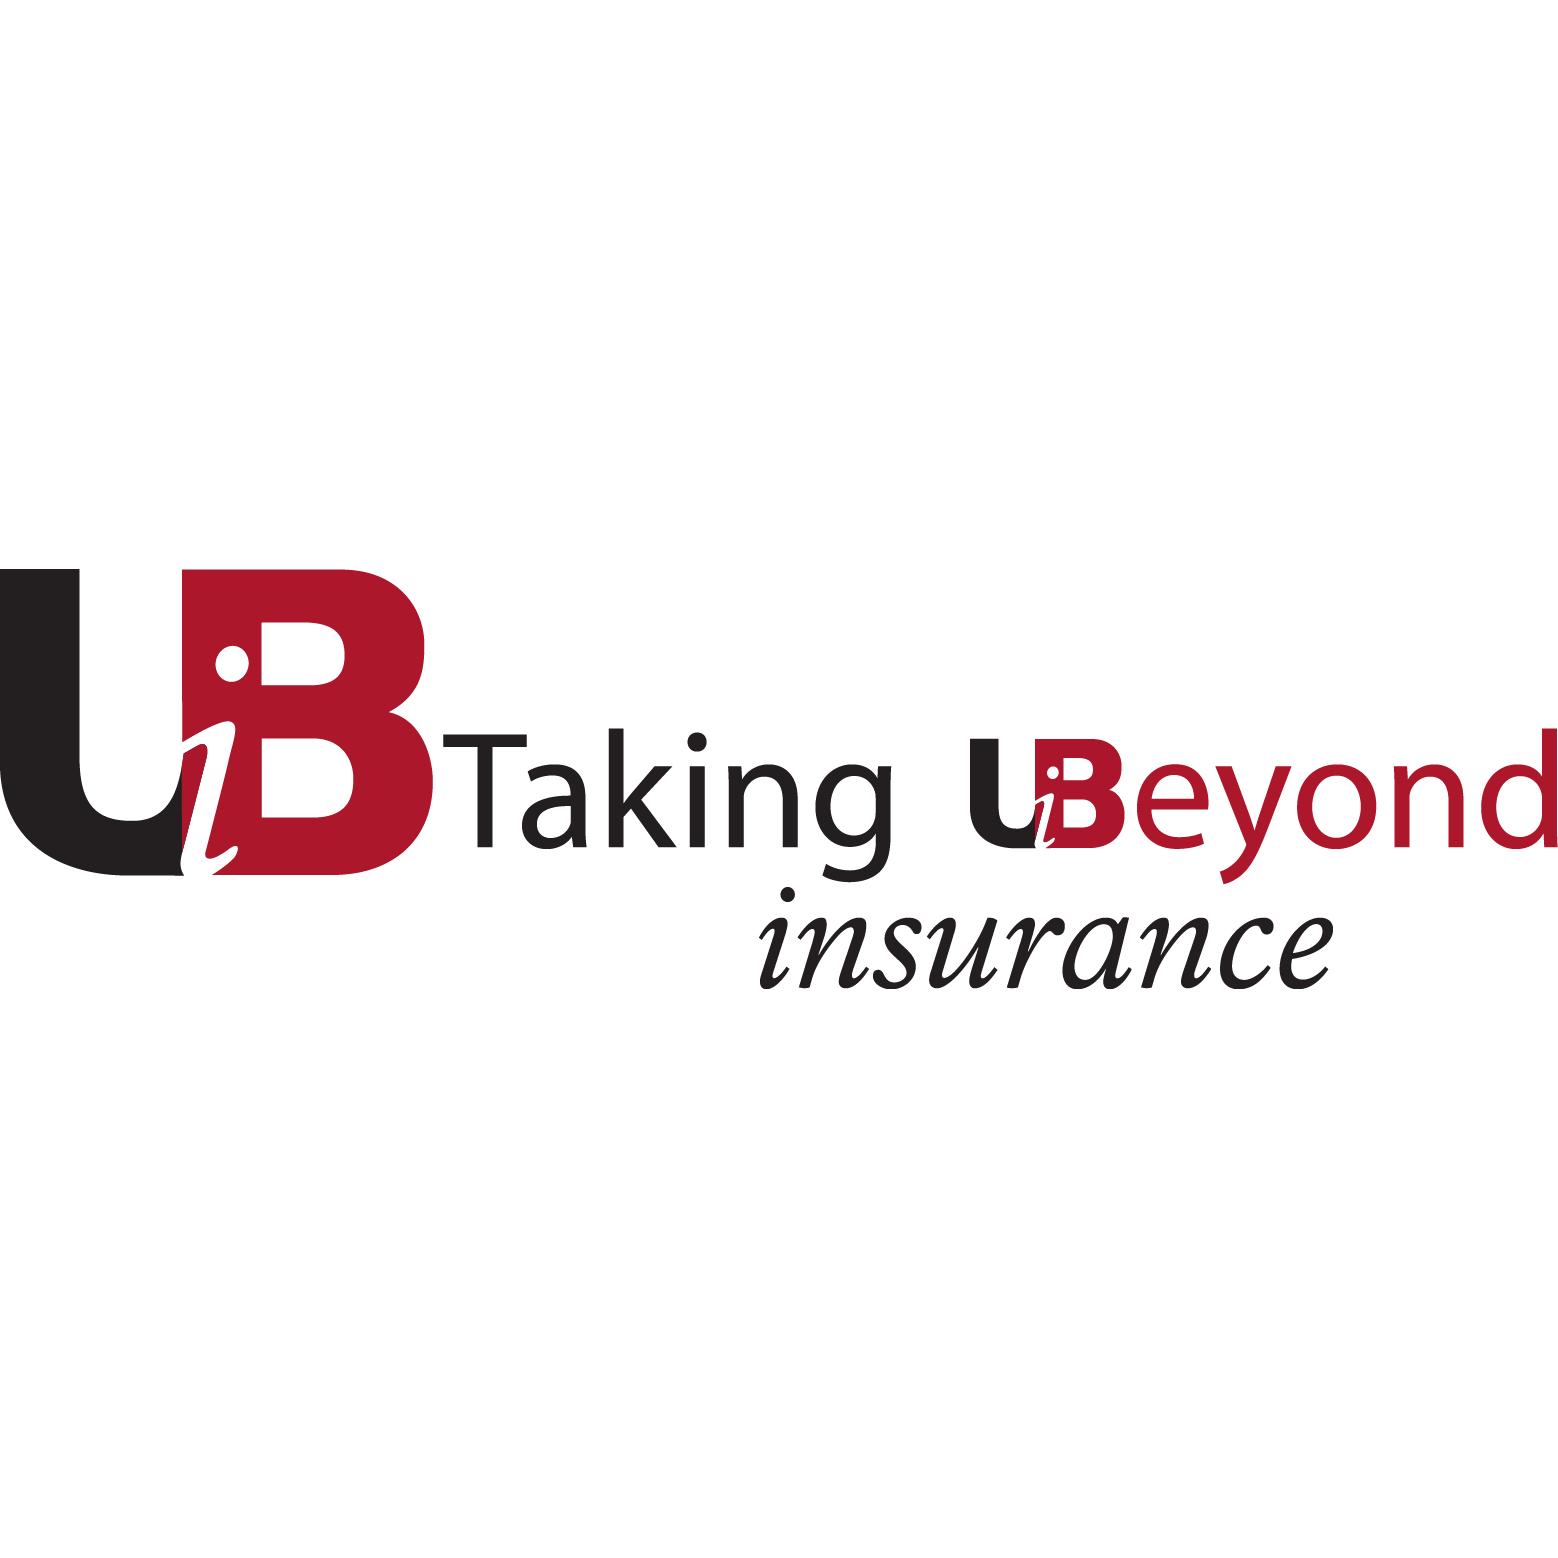 Universal Business Insurance